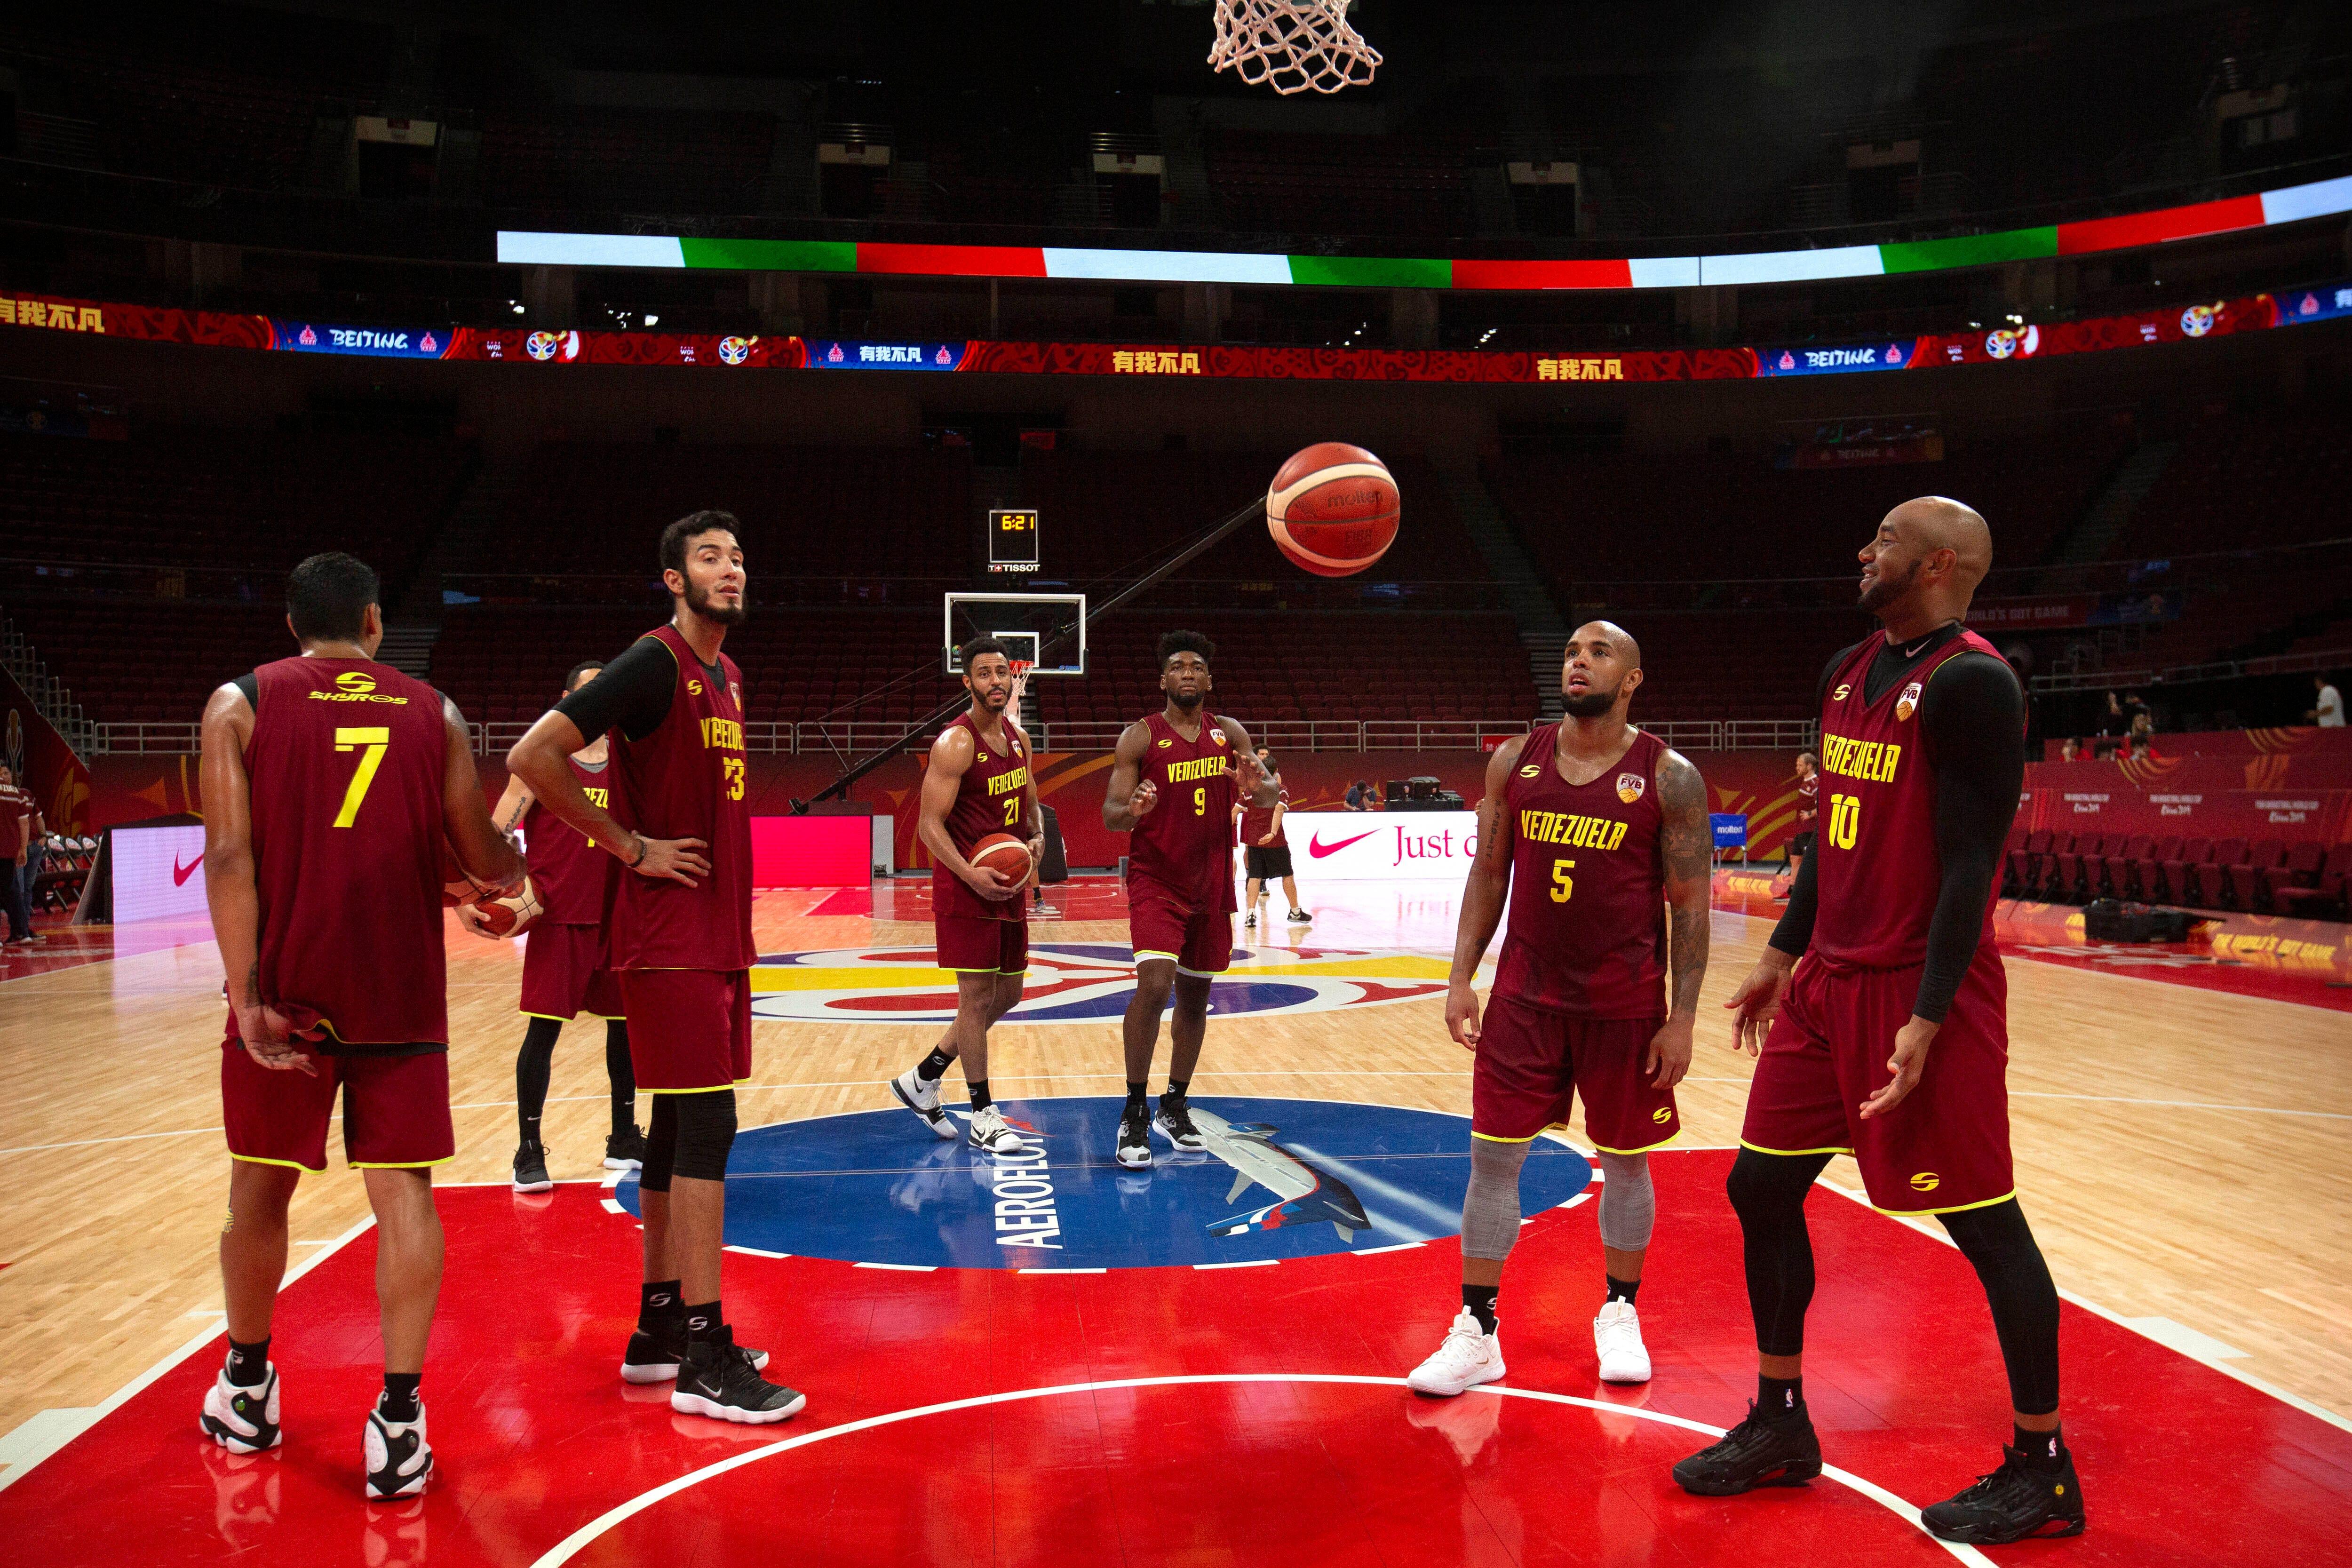 Venezuela basketball team hopes to send home some good news thumbnail